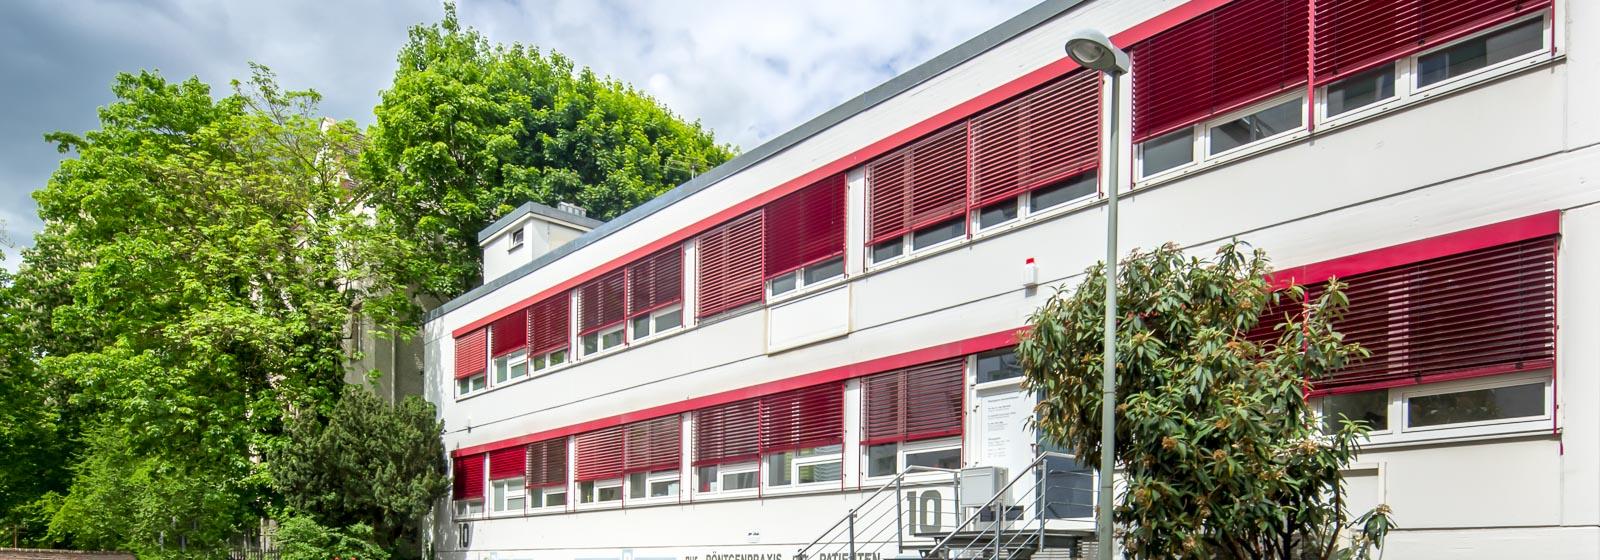 Ulm - Radiologie Praxis Parkstrasse